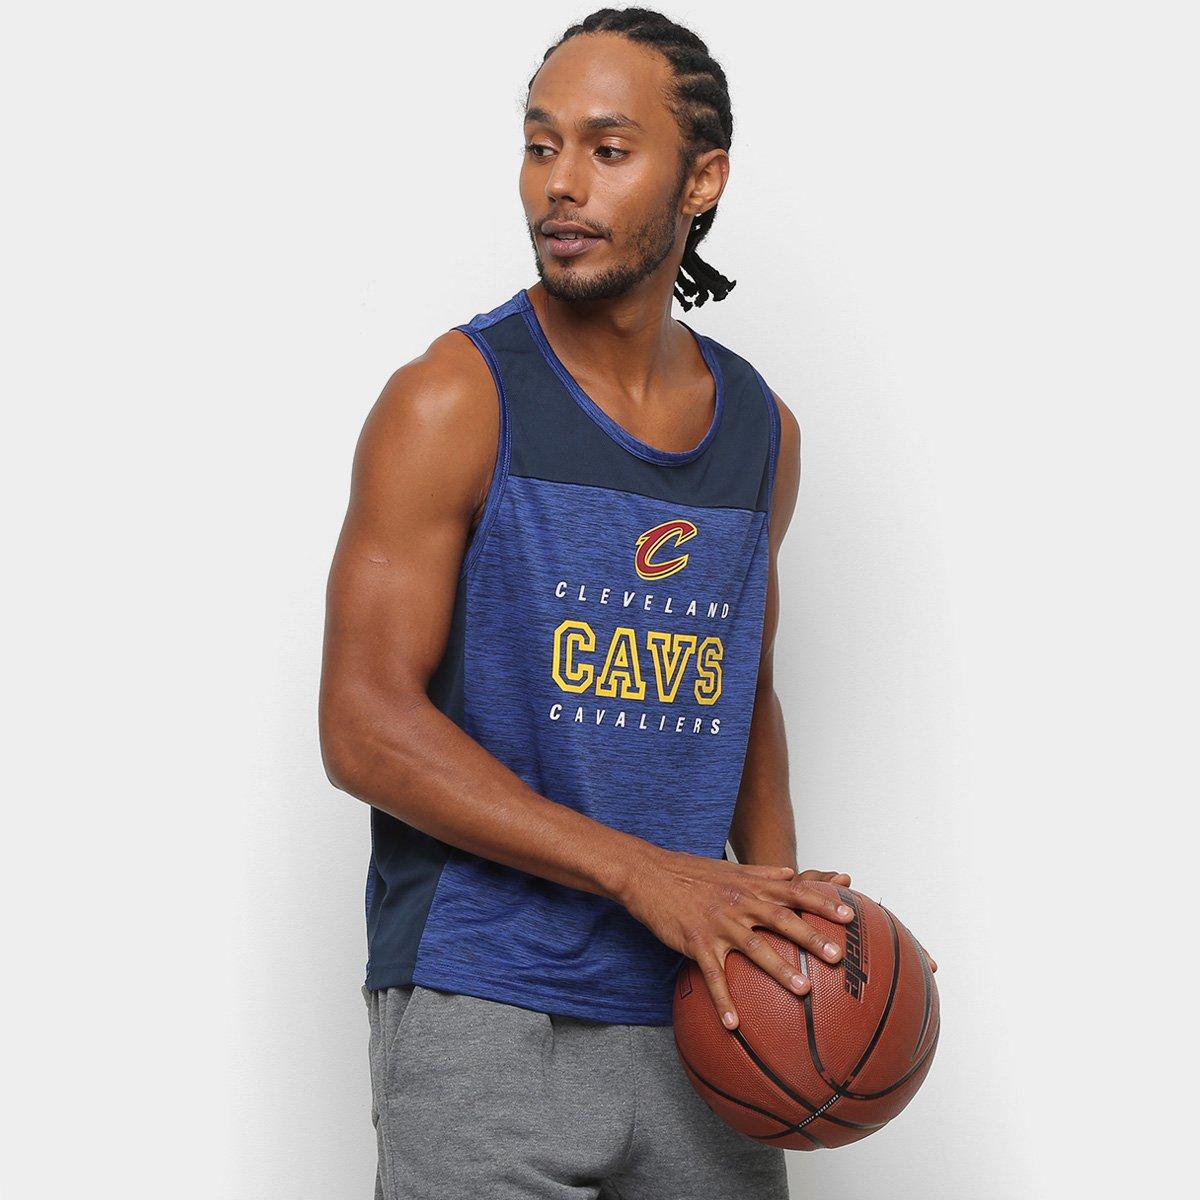 Regata NBA Cleveland Cavaliers 17 Fio Tinto Mesh Masculina - Compre ... 87f76fabe8e9f